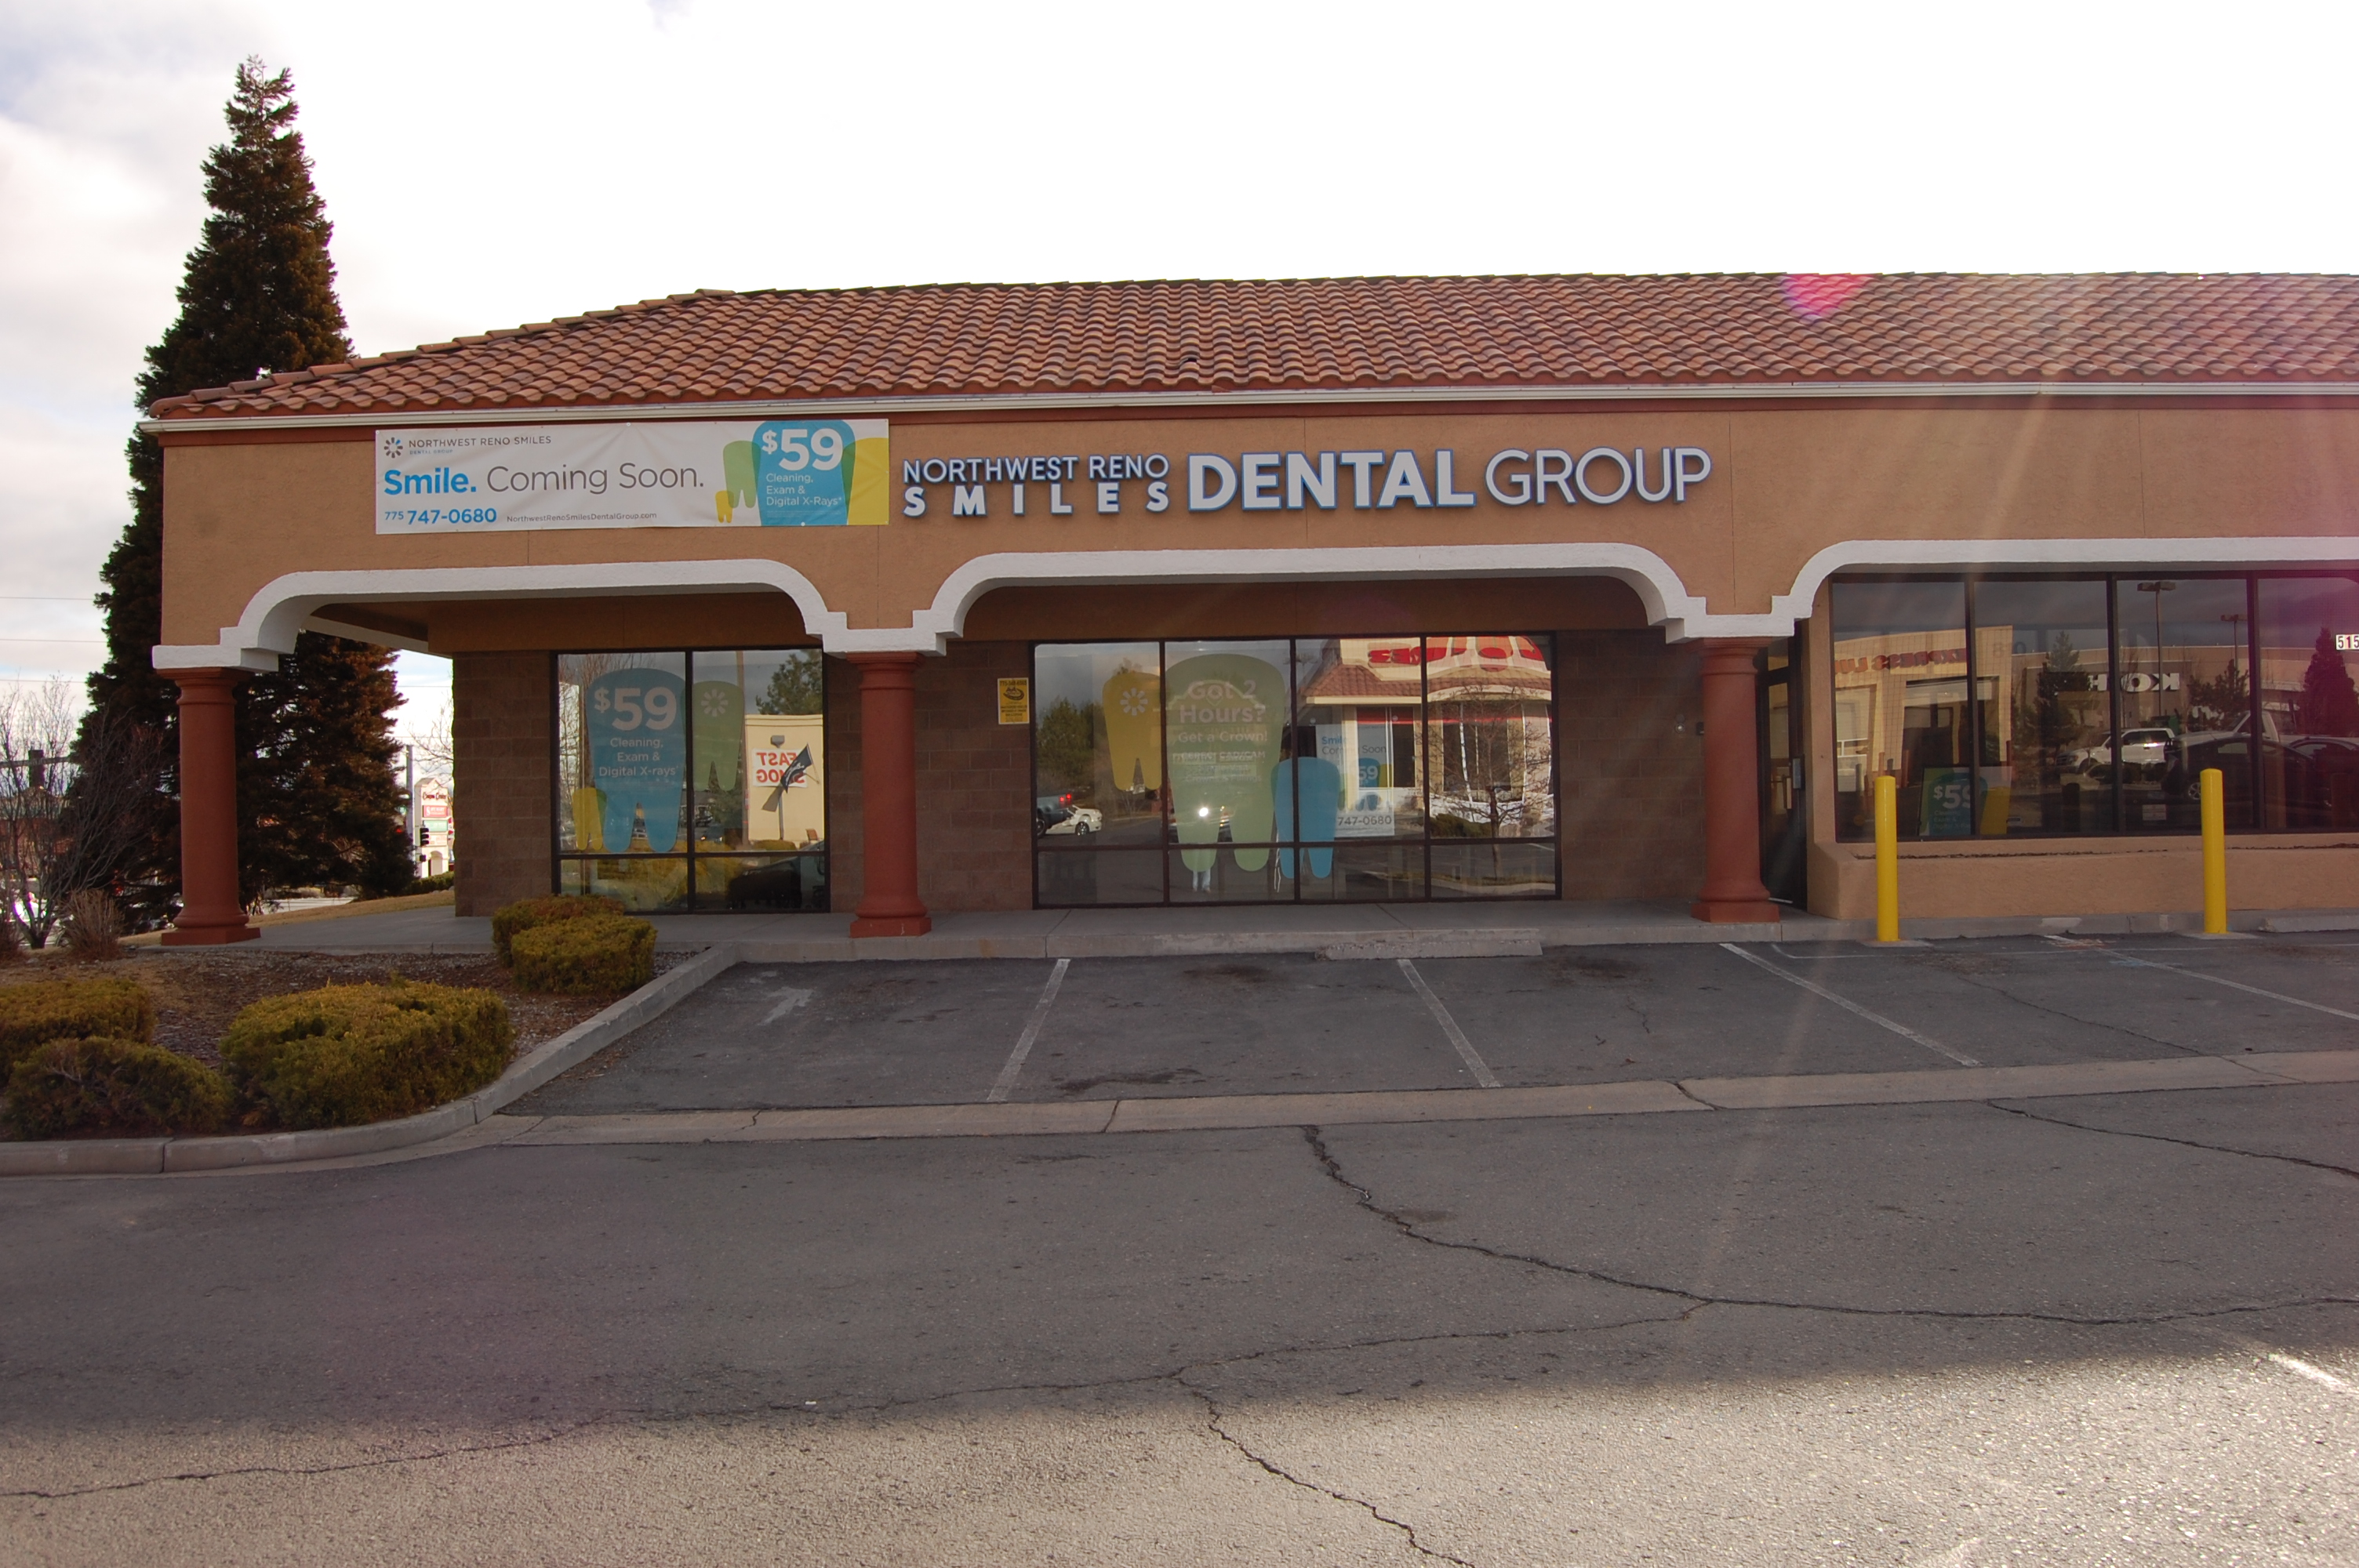 Northwest Reno Smiles Dental Group image 16